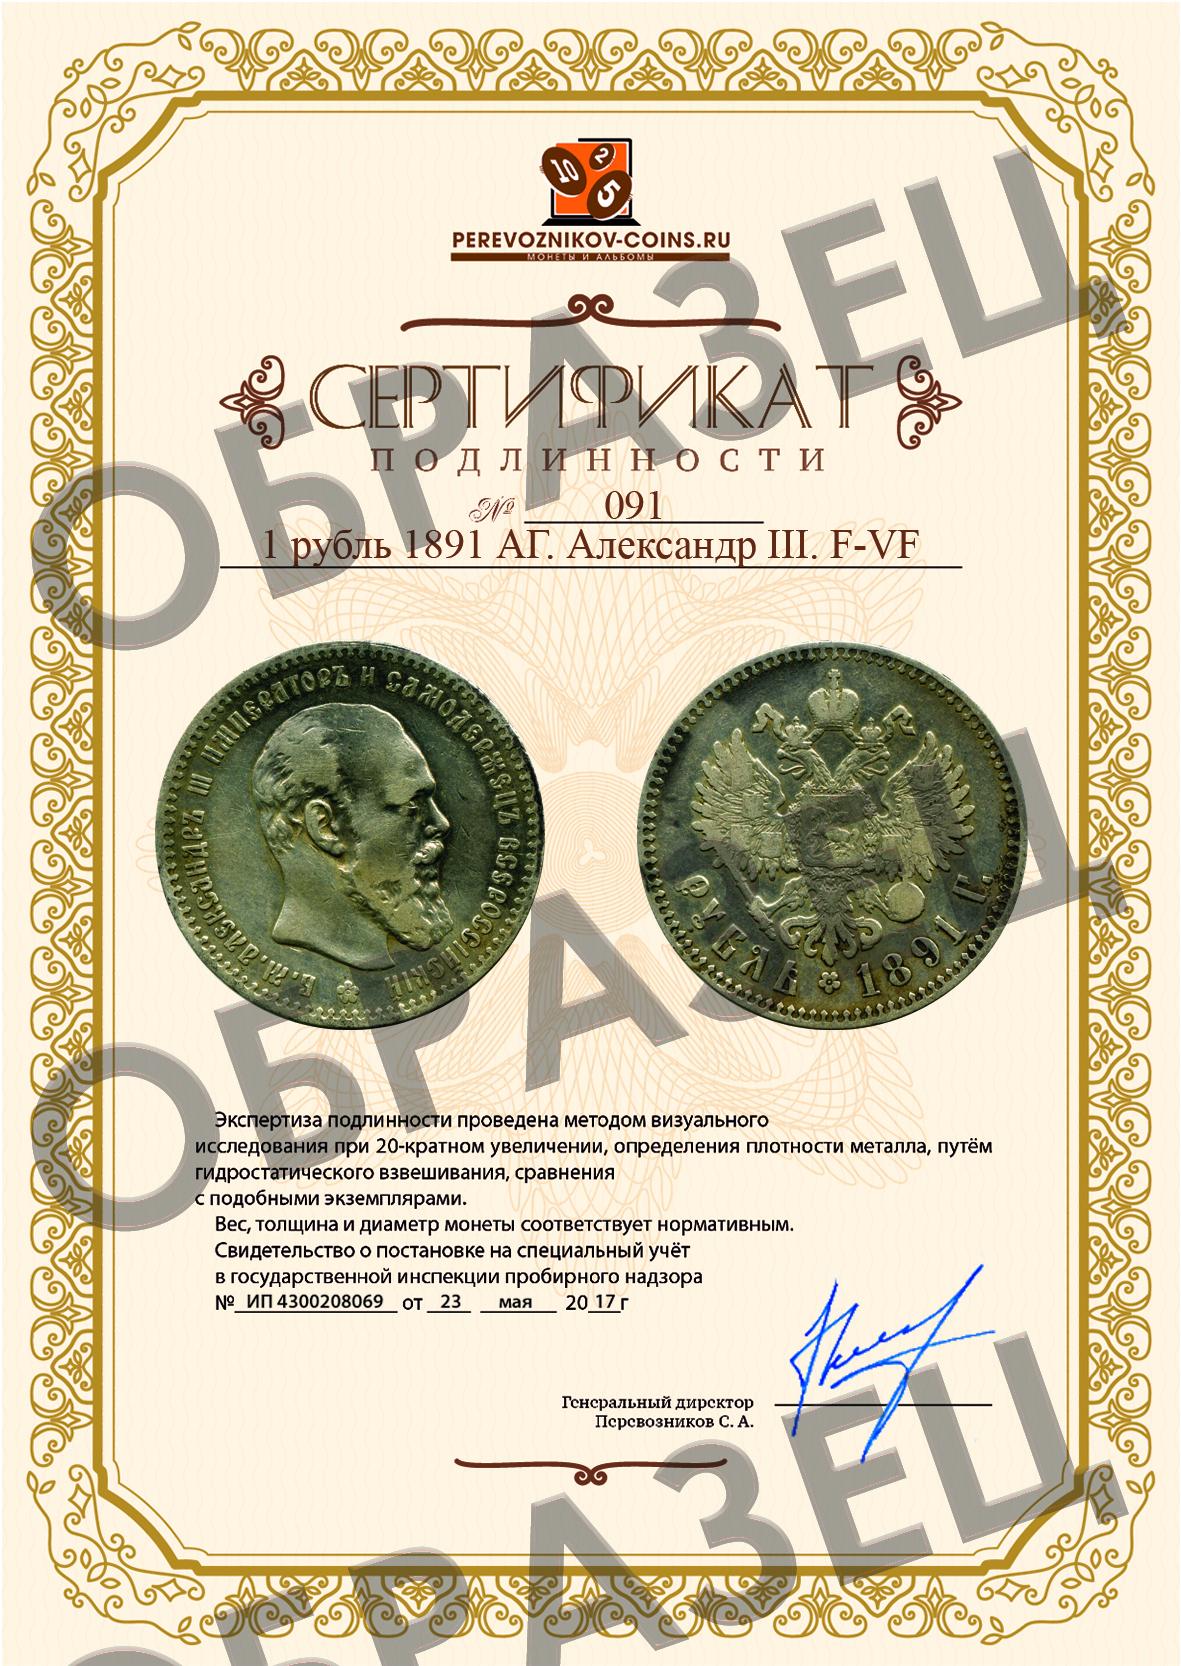 1 рубль 1891 АГ. Александр III. F-VF